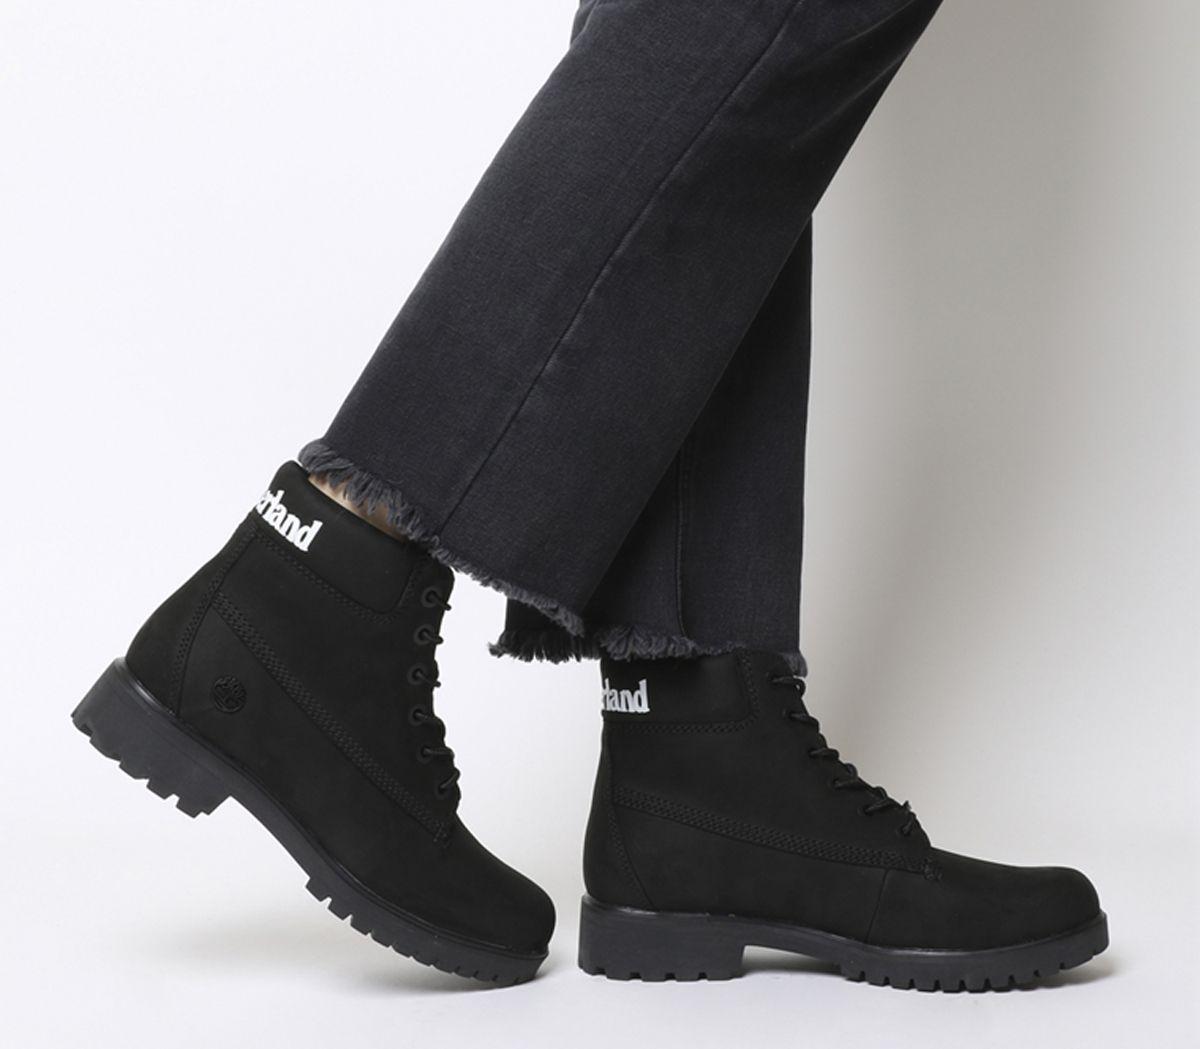 73d783b3096 Slim 6 Inch Logo Boots